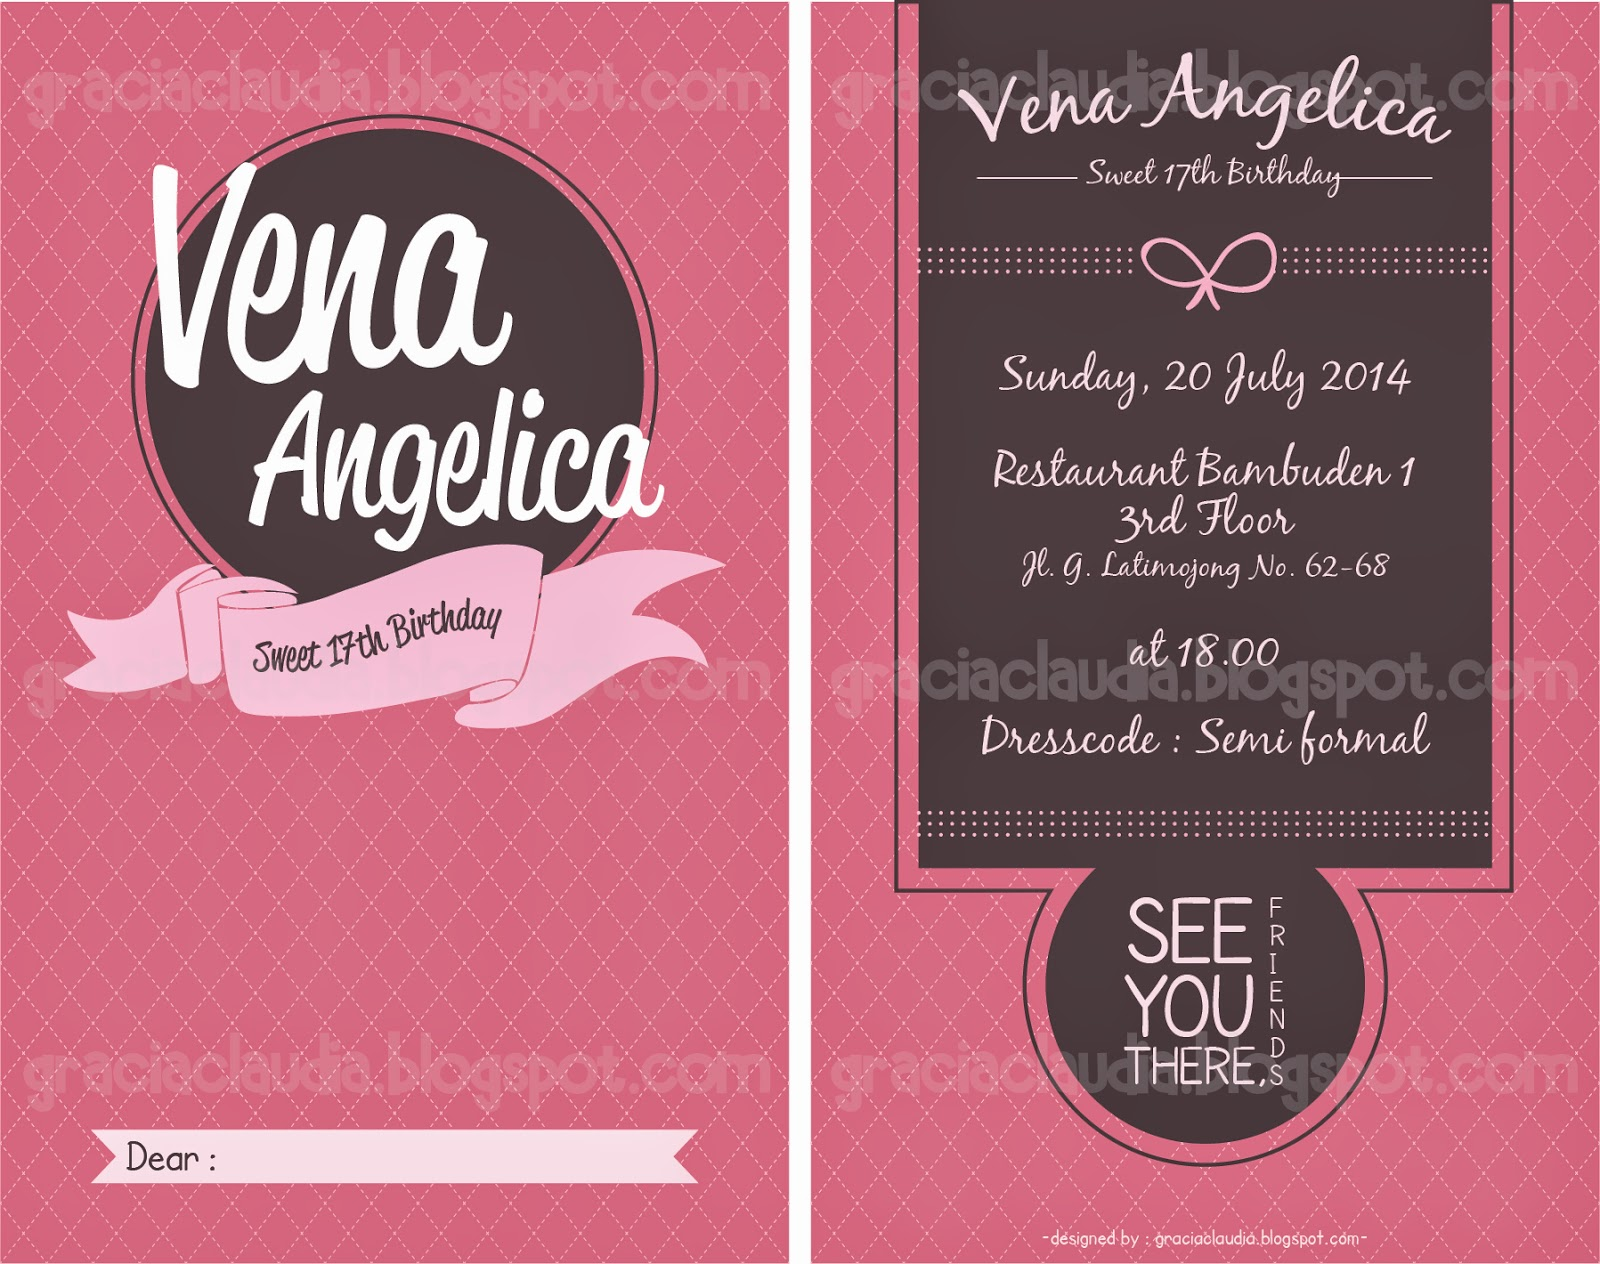 Gc design make up venas sweet 17th birthday invitation soft file stopboris Image collections